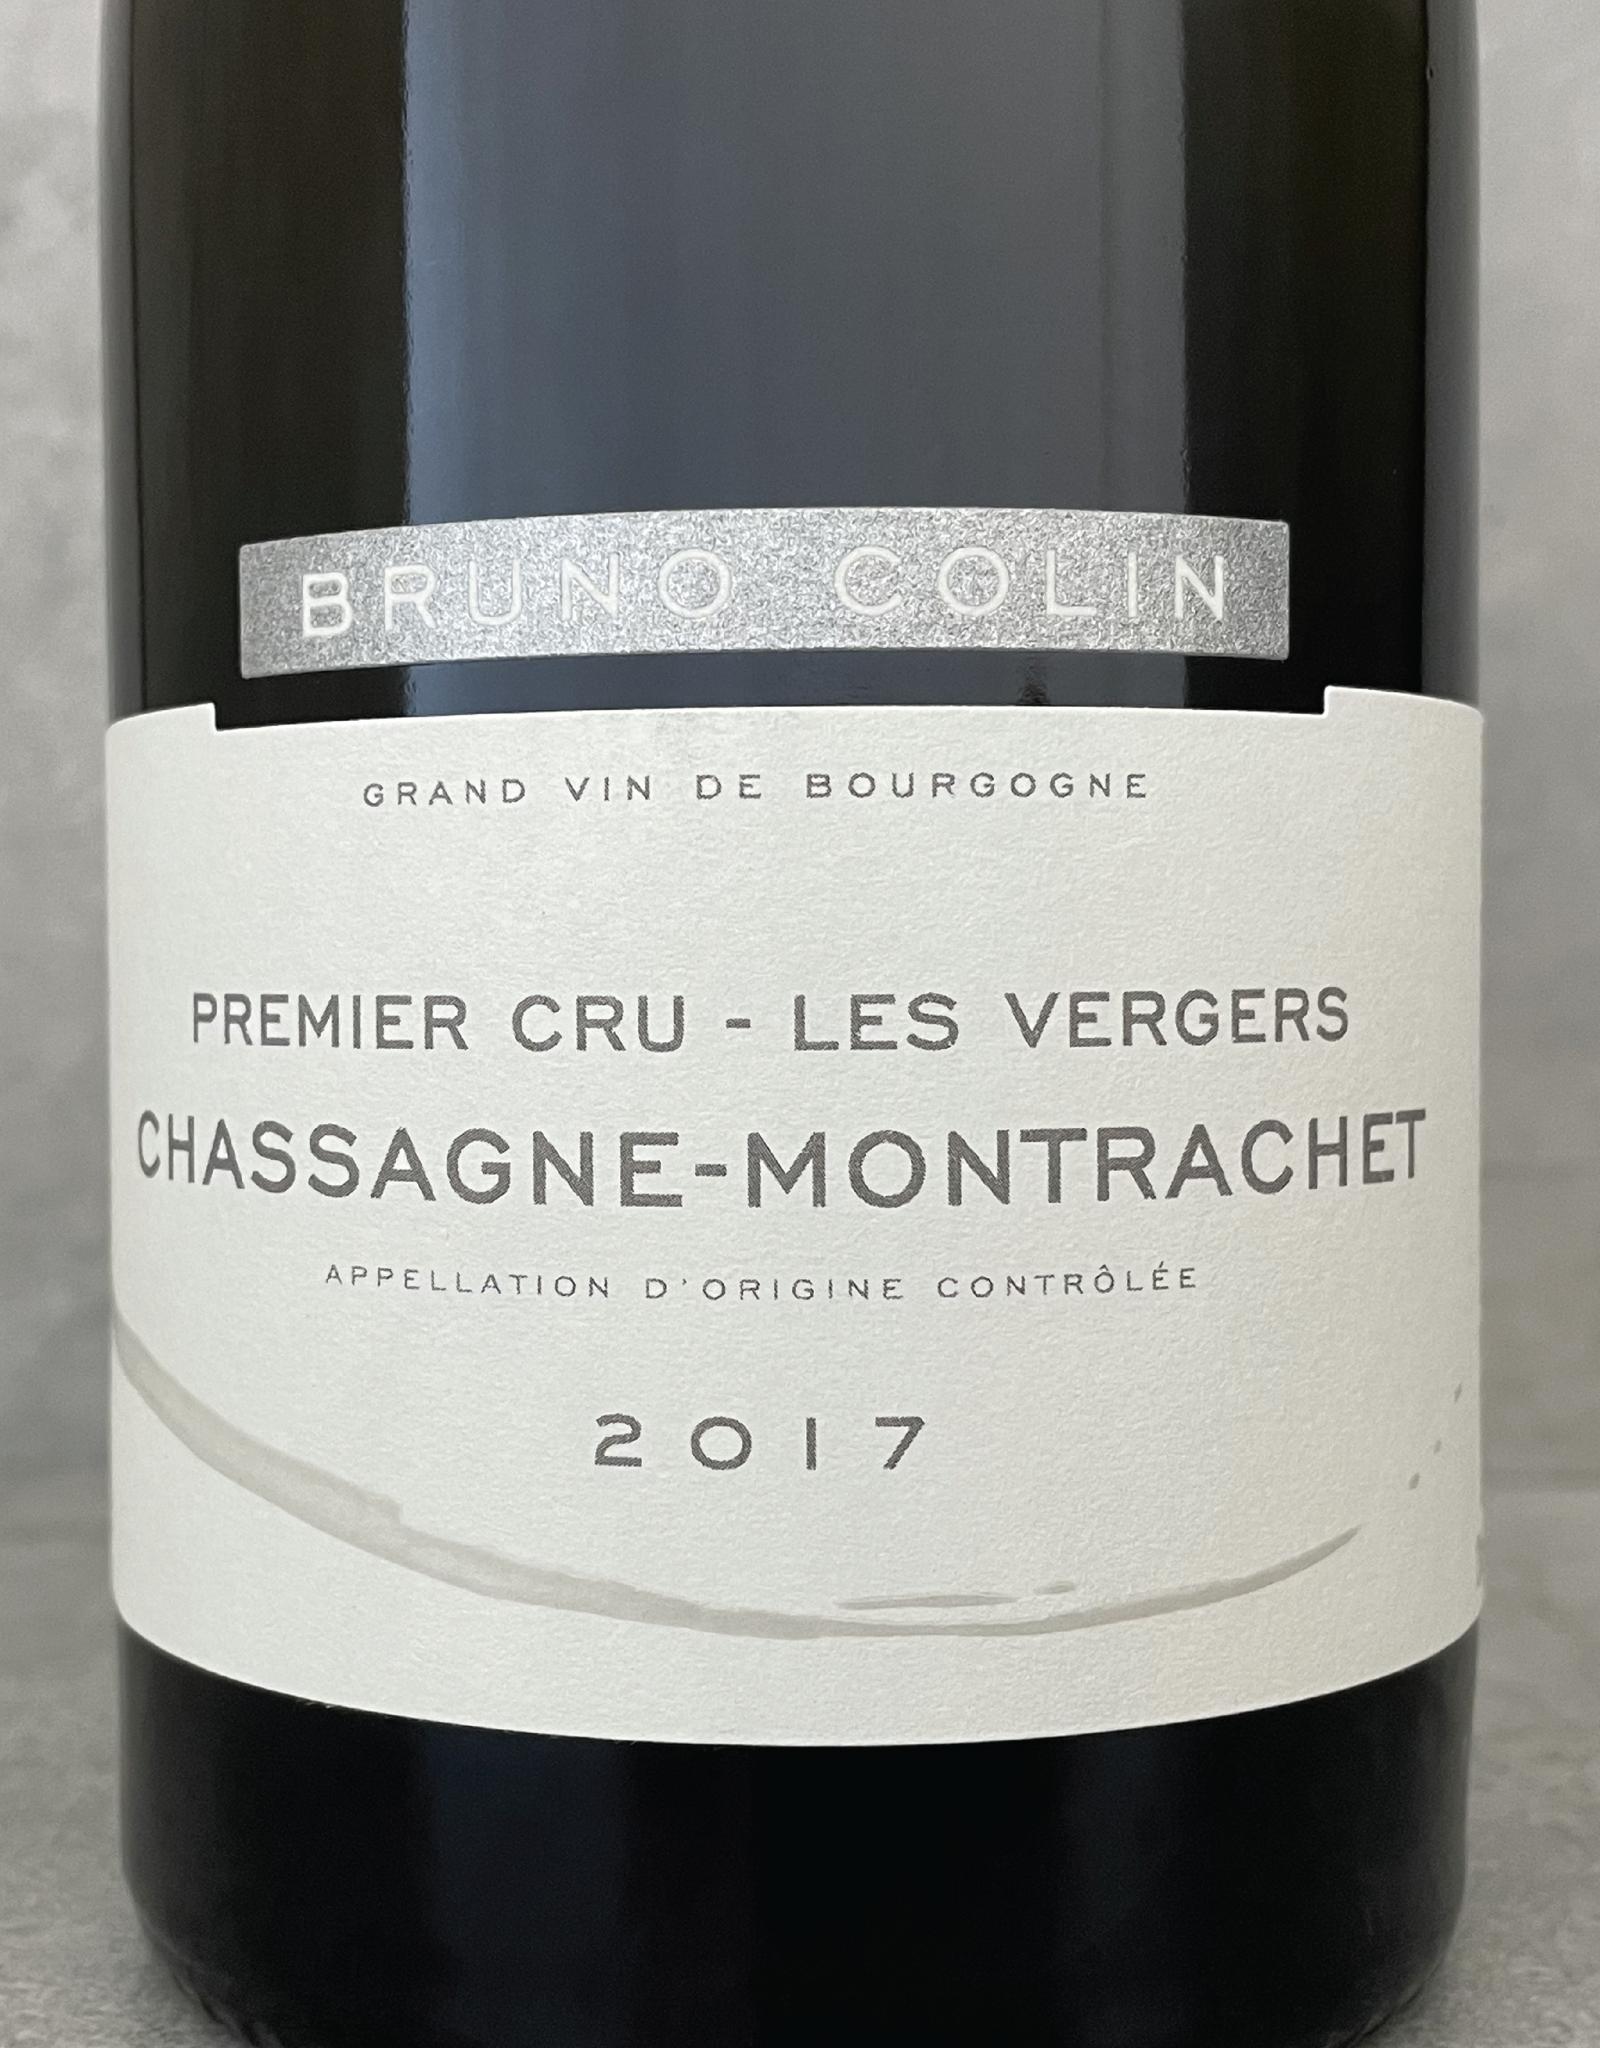 Bruno Colin Chassagne Montrachet 1er Cru Les Vergers 2018